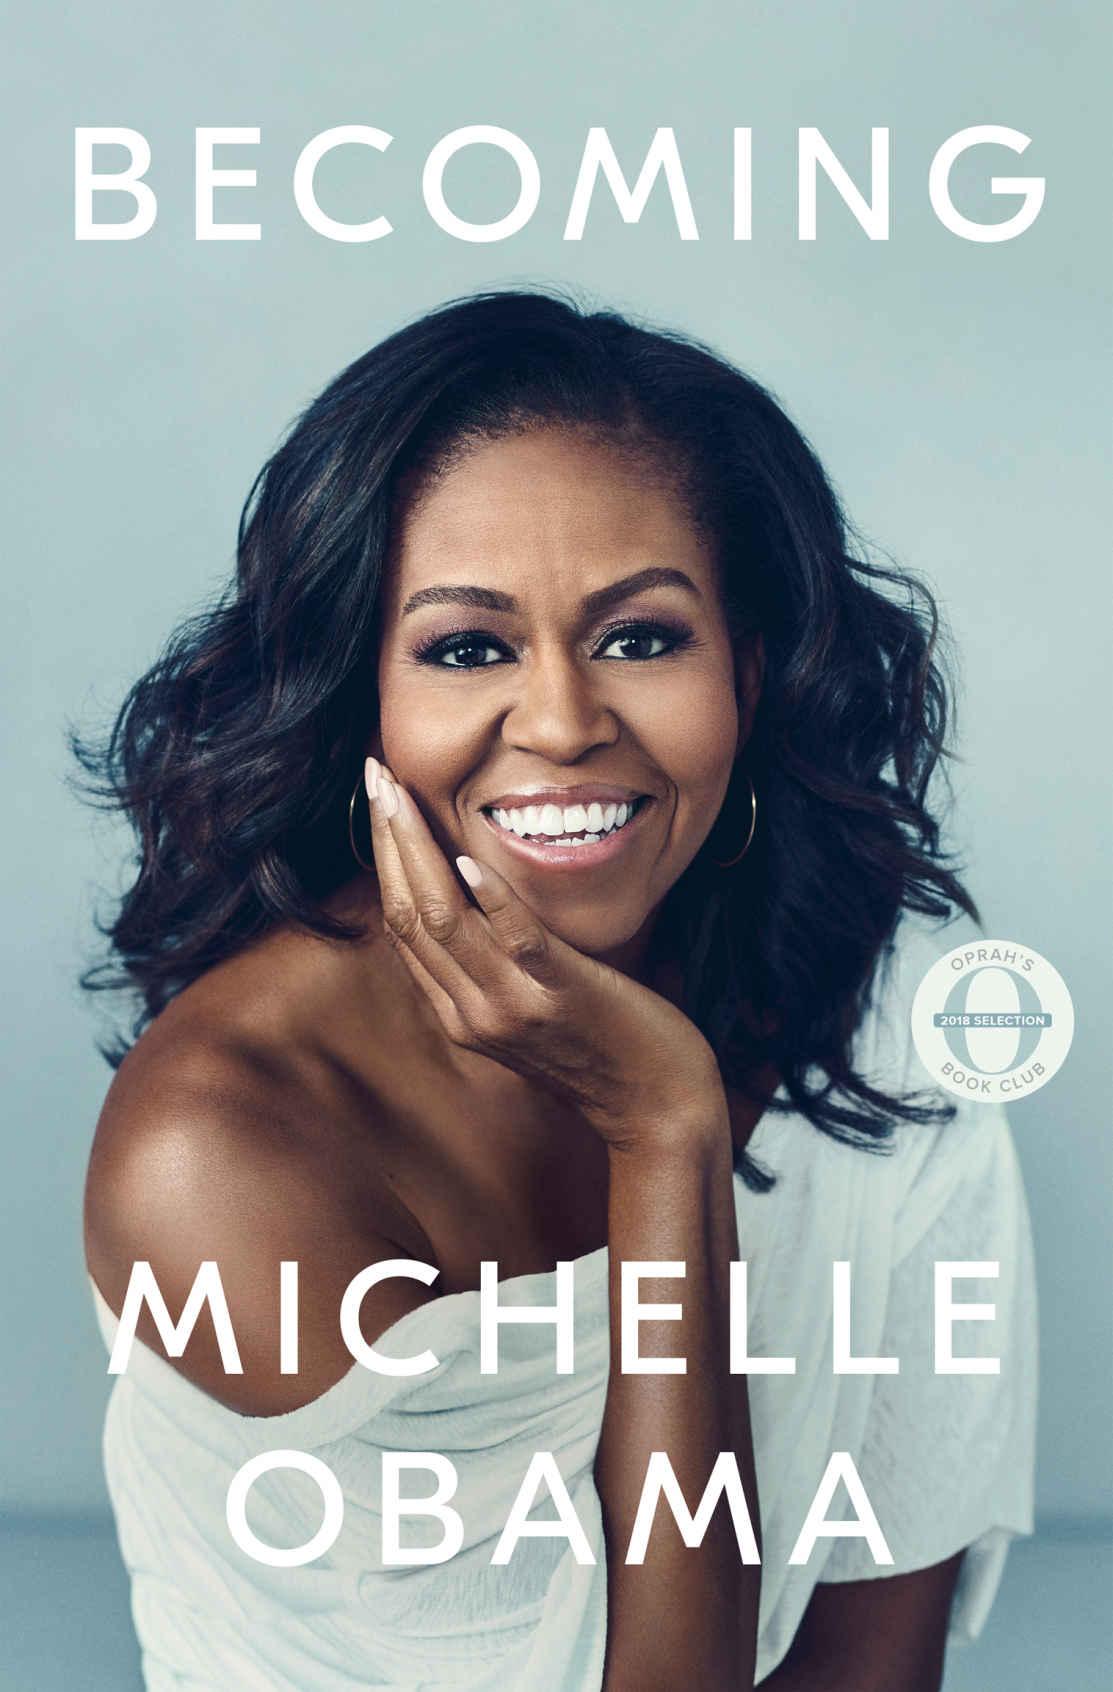 Becoming - Michelle Obama [kindle] [mobi]